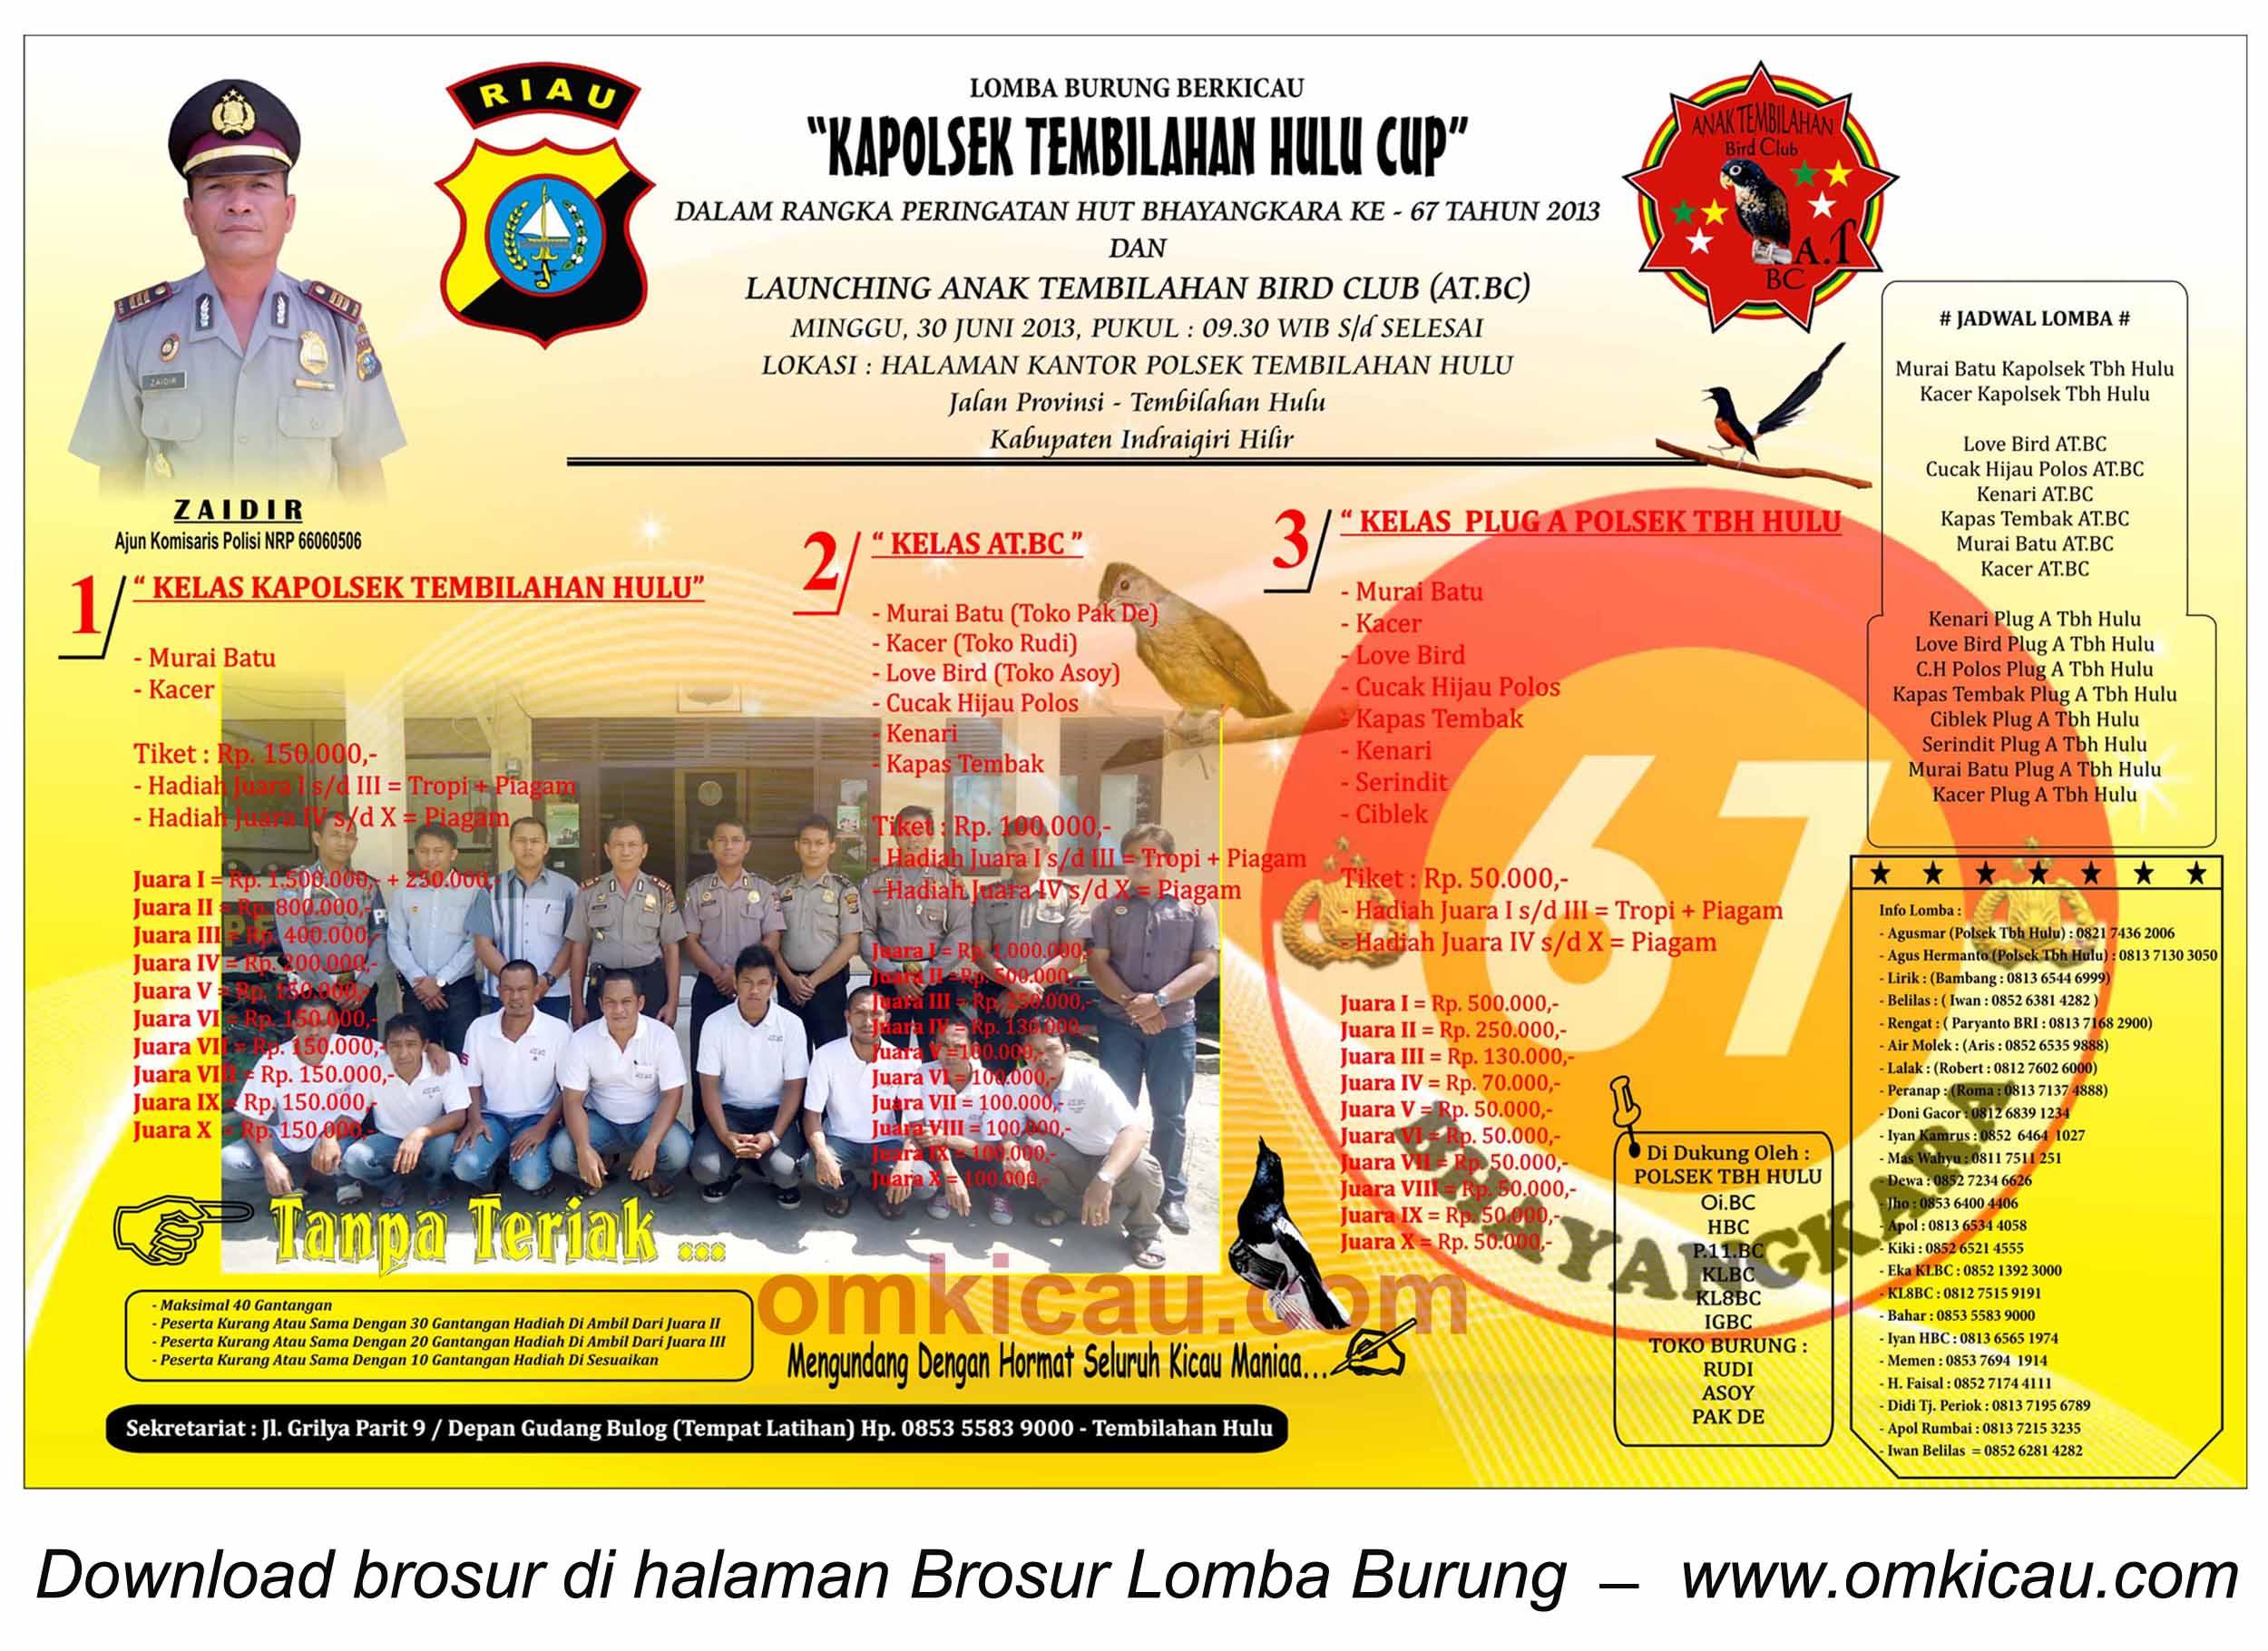 Brosur Lomba Burung Kapolsek Tembilahan Hulu Cup, 30 Juni 2013